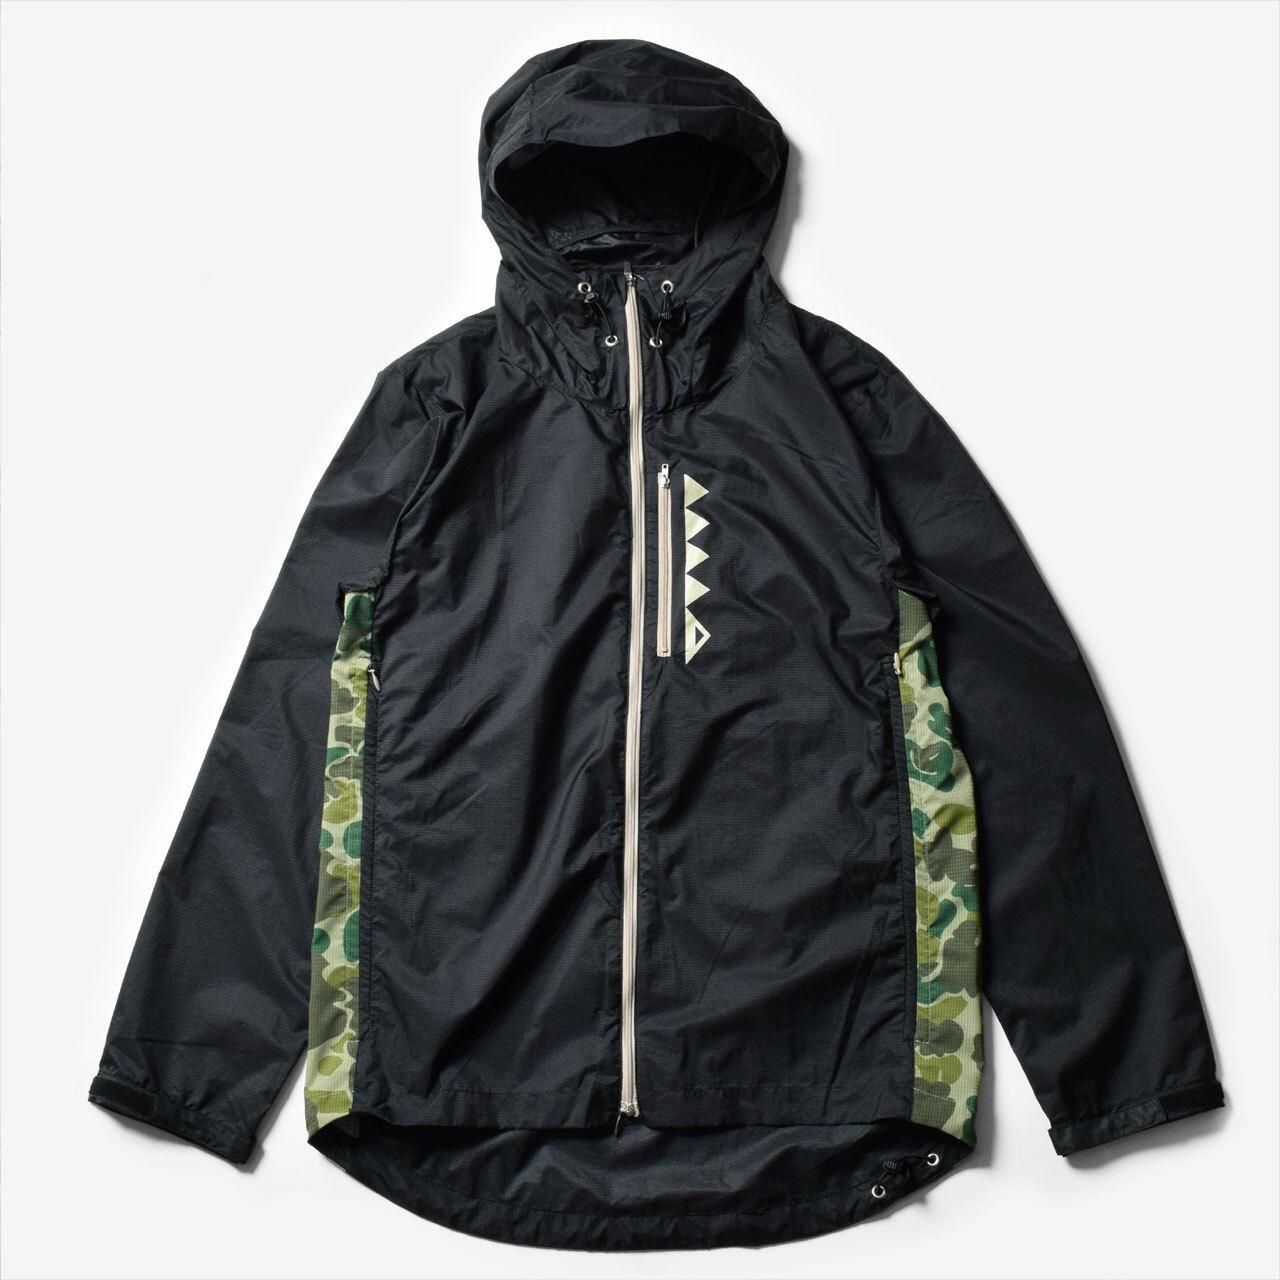 【20%OFF】Mountain Martial Arts  / MMA Packable Run Jacket